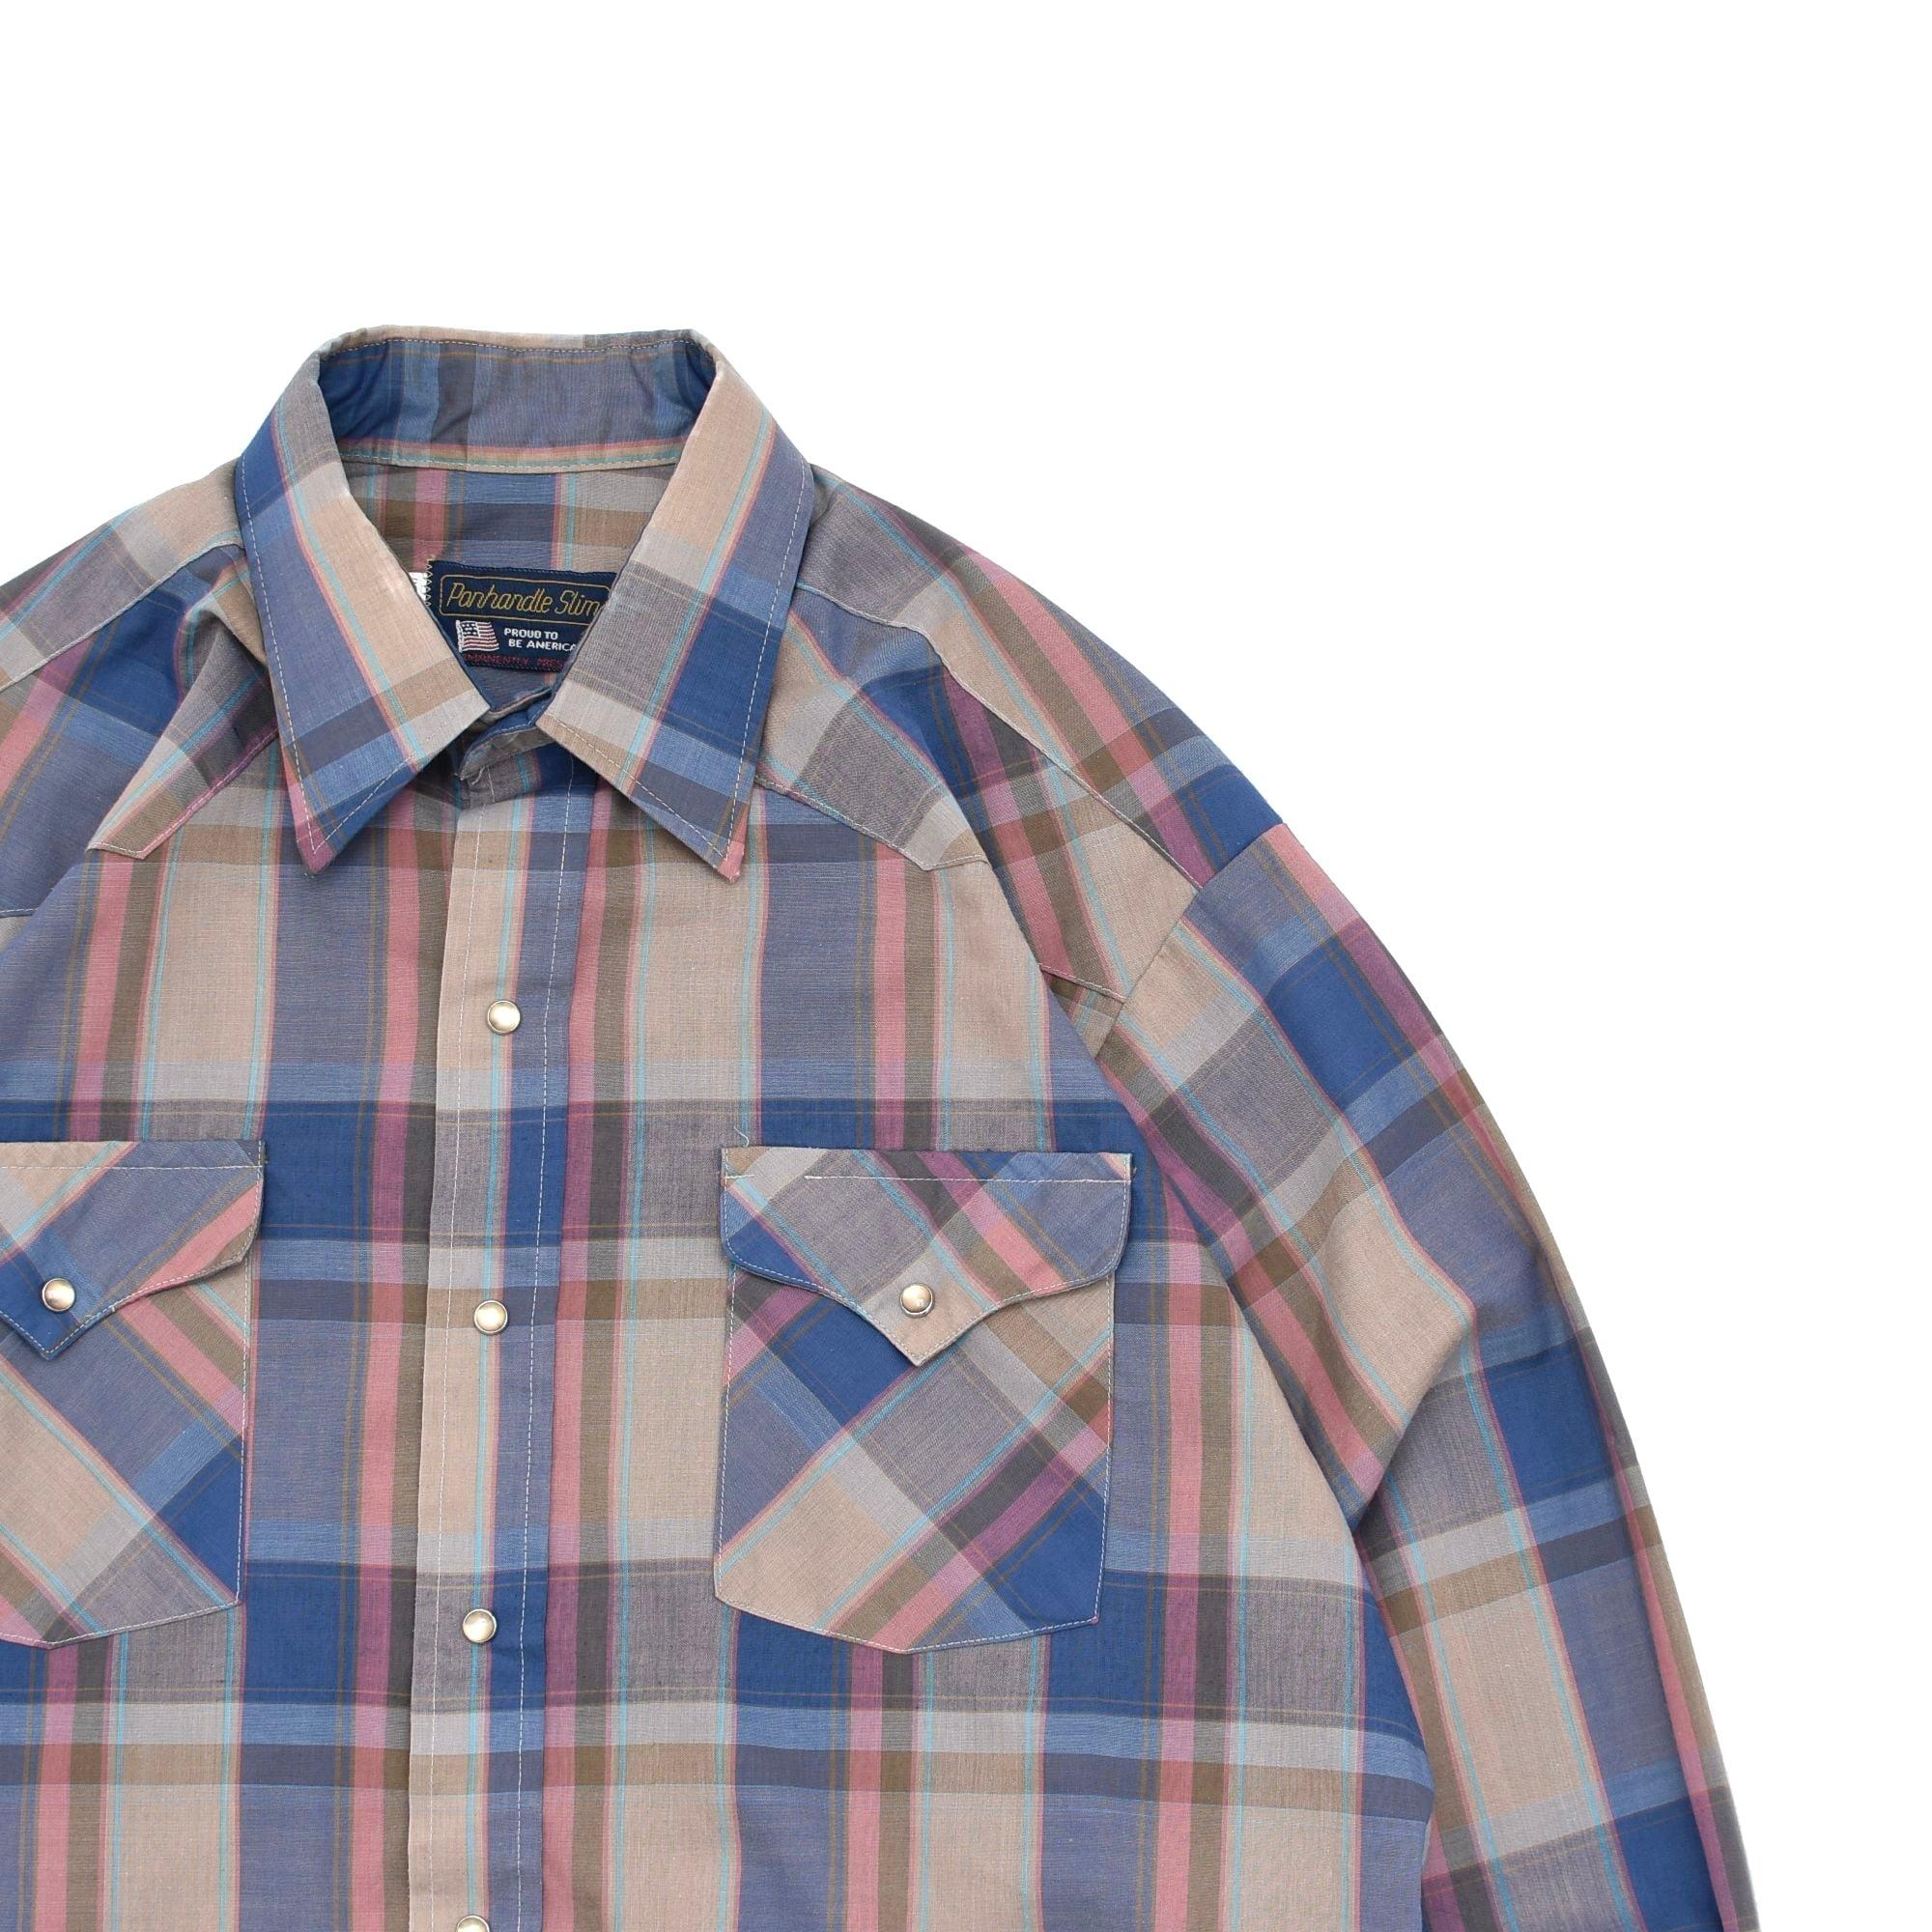 70's Panhandl Slim check western shirt